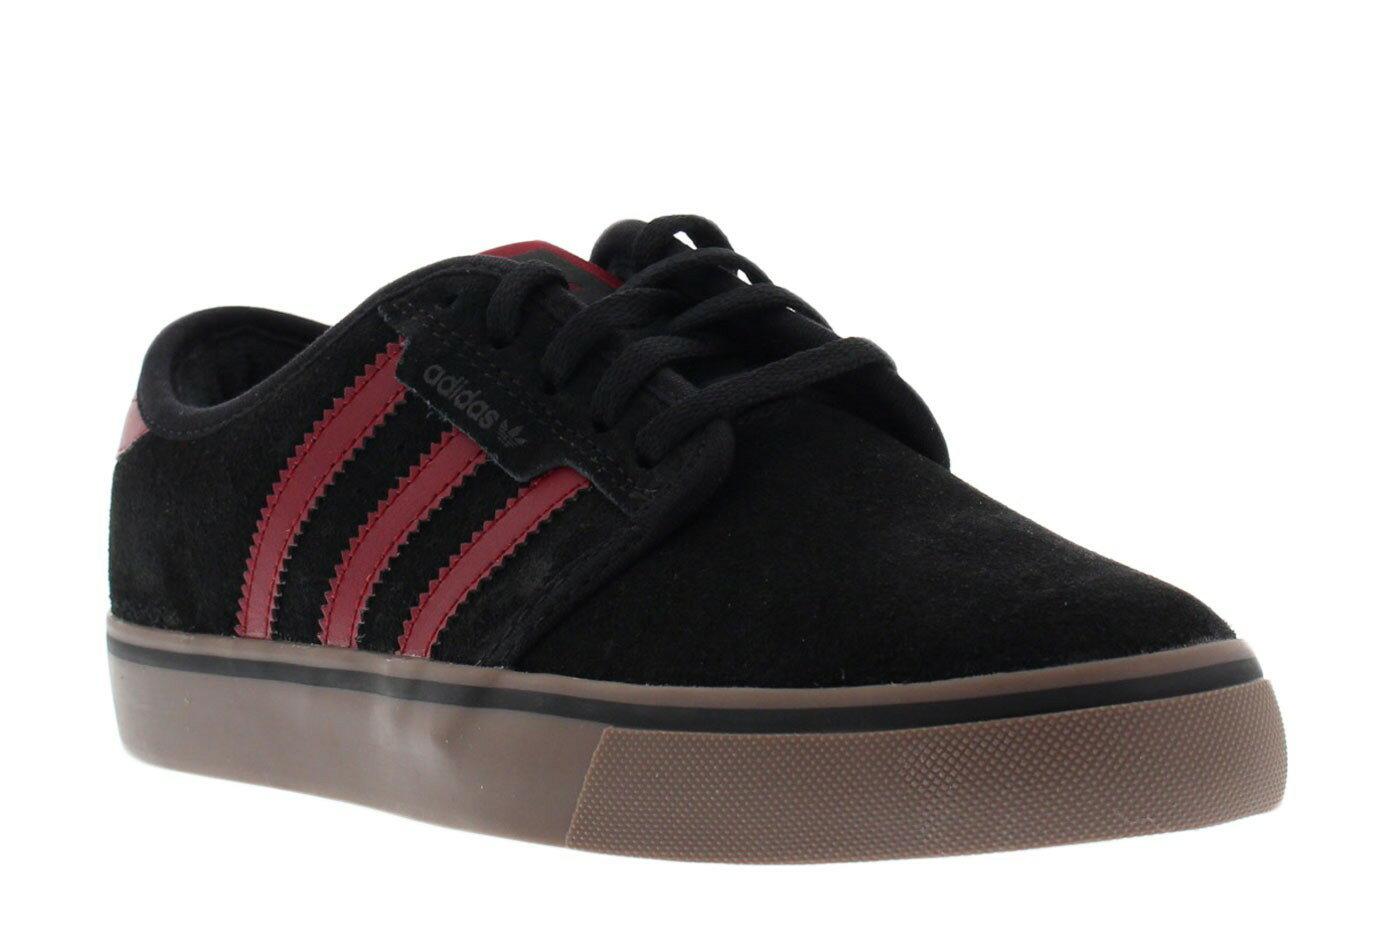 ADIDAS SEELEY J 黑紅 女鞋 US 5.5~6.5 D68914 E倉